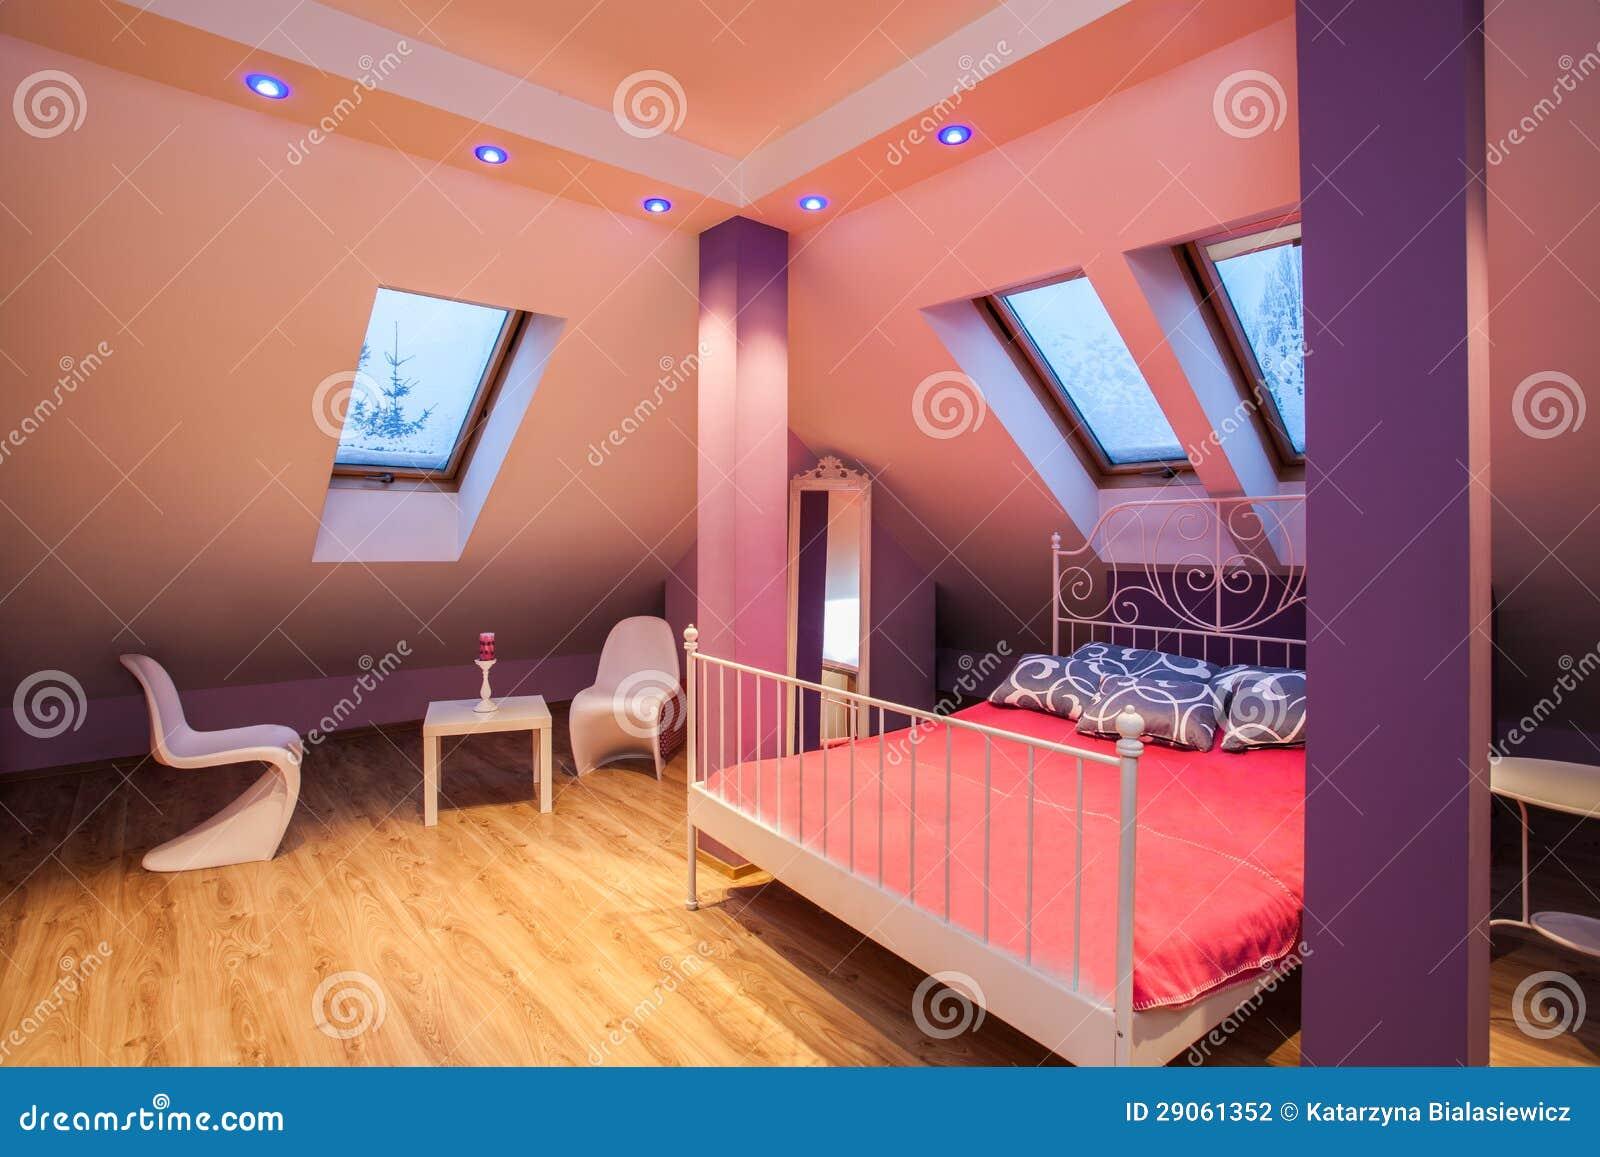 Amaranth House - Sweet Bedroom Stock Photography - Image: 29061352